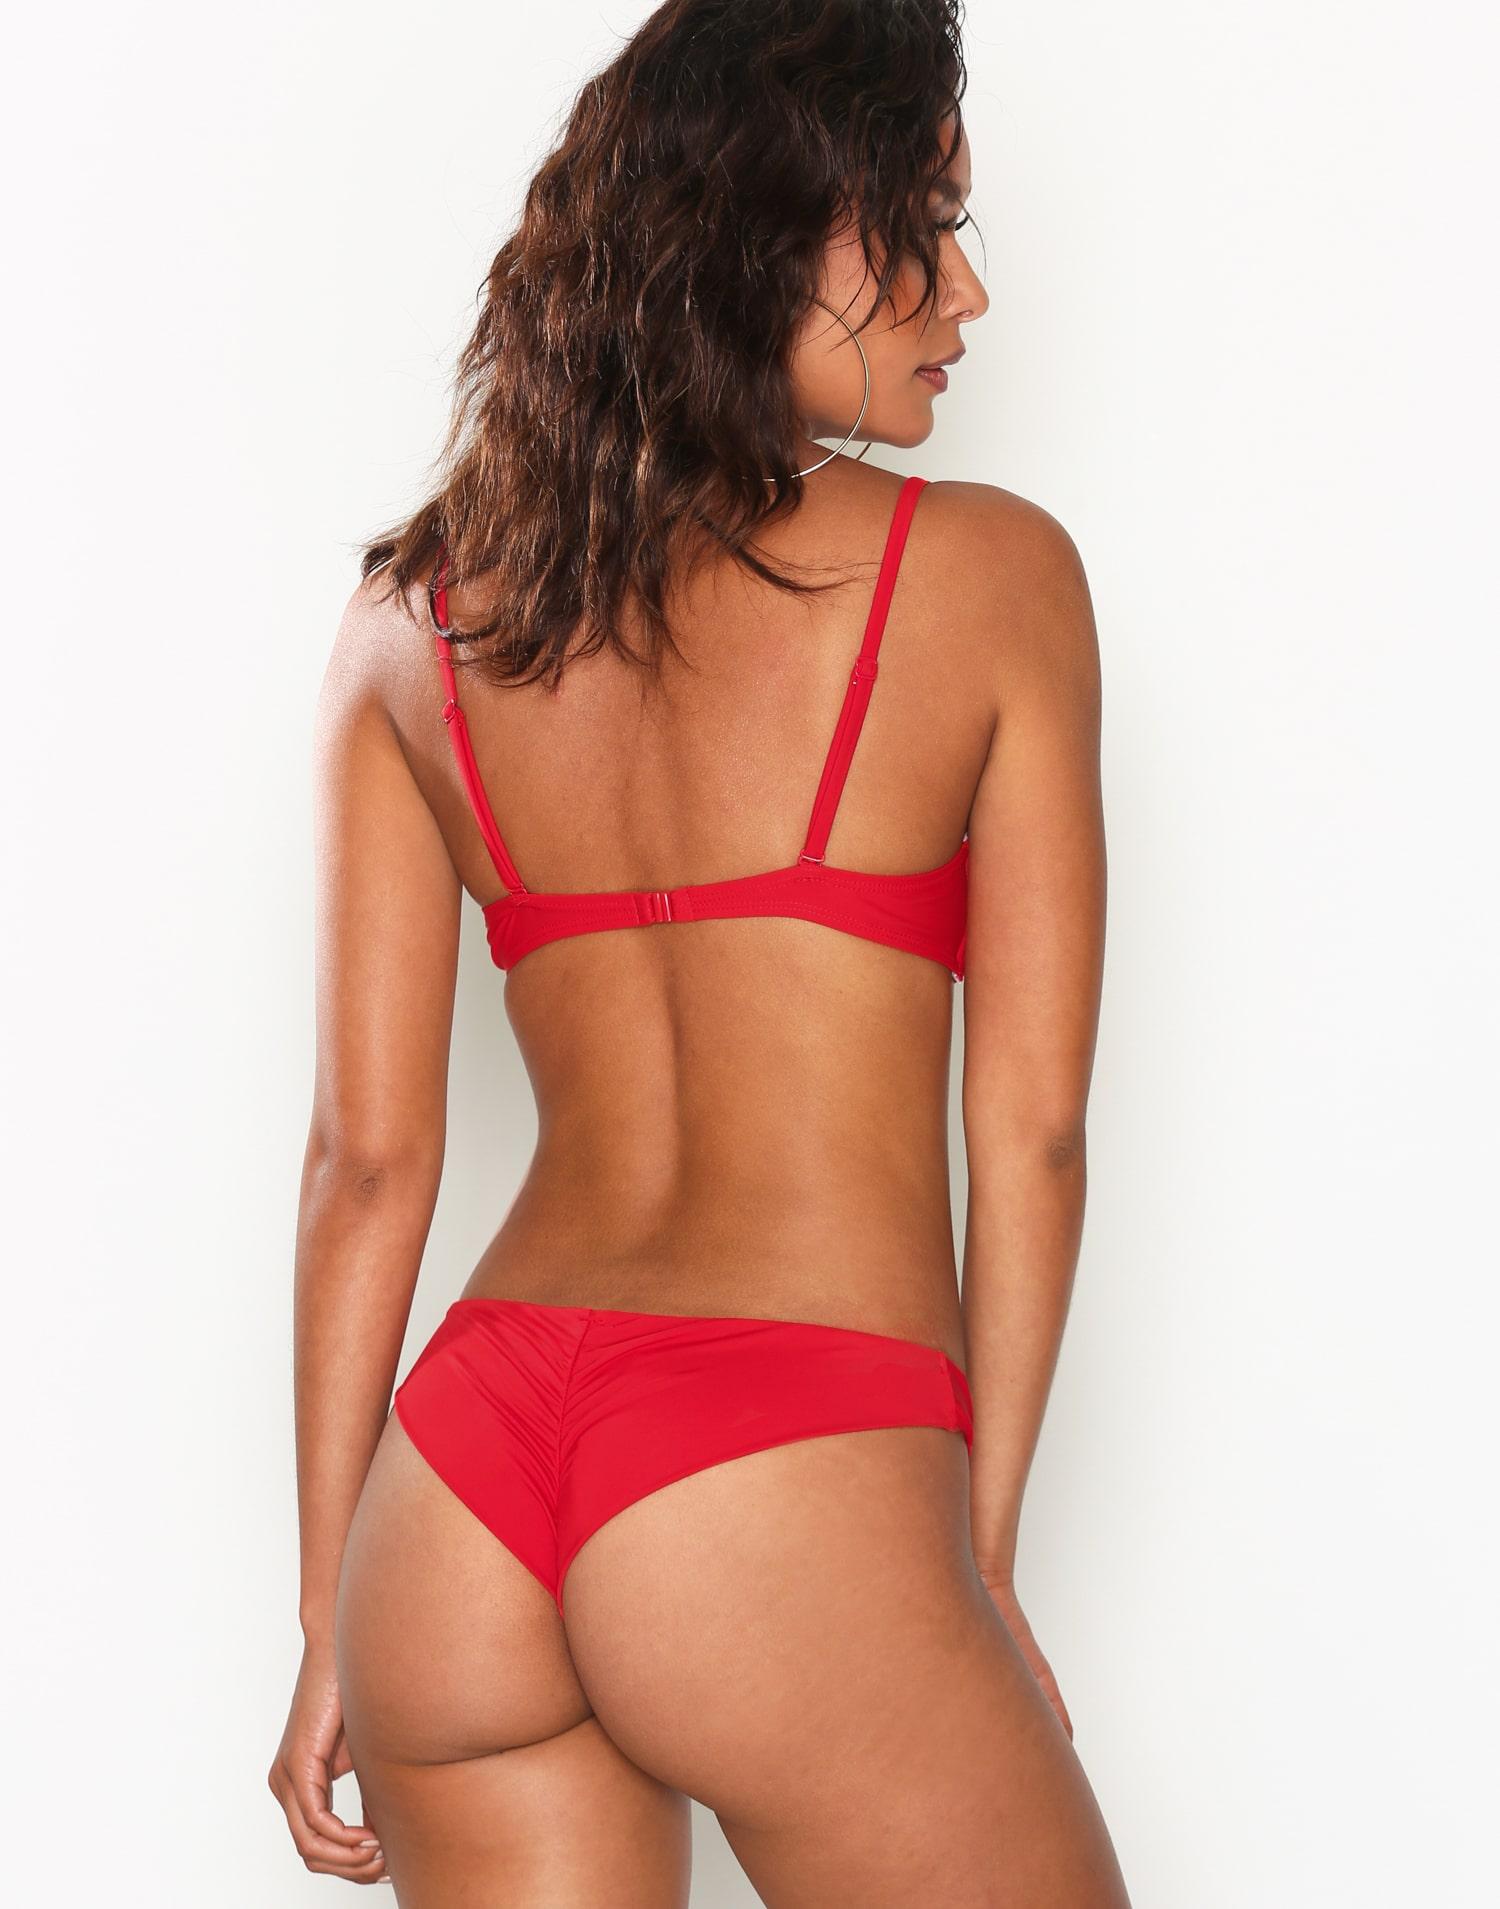 röda bikinitrosor scruch brasilianska